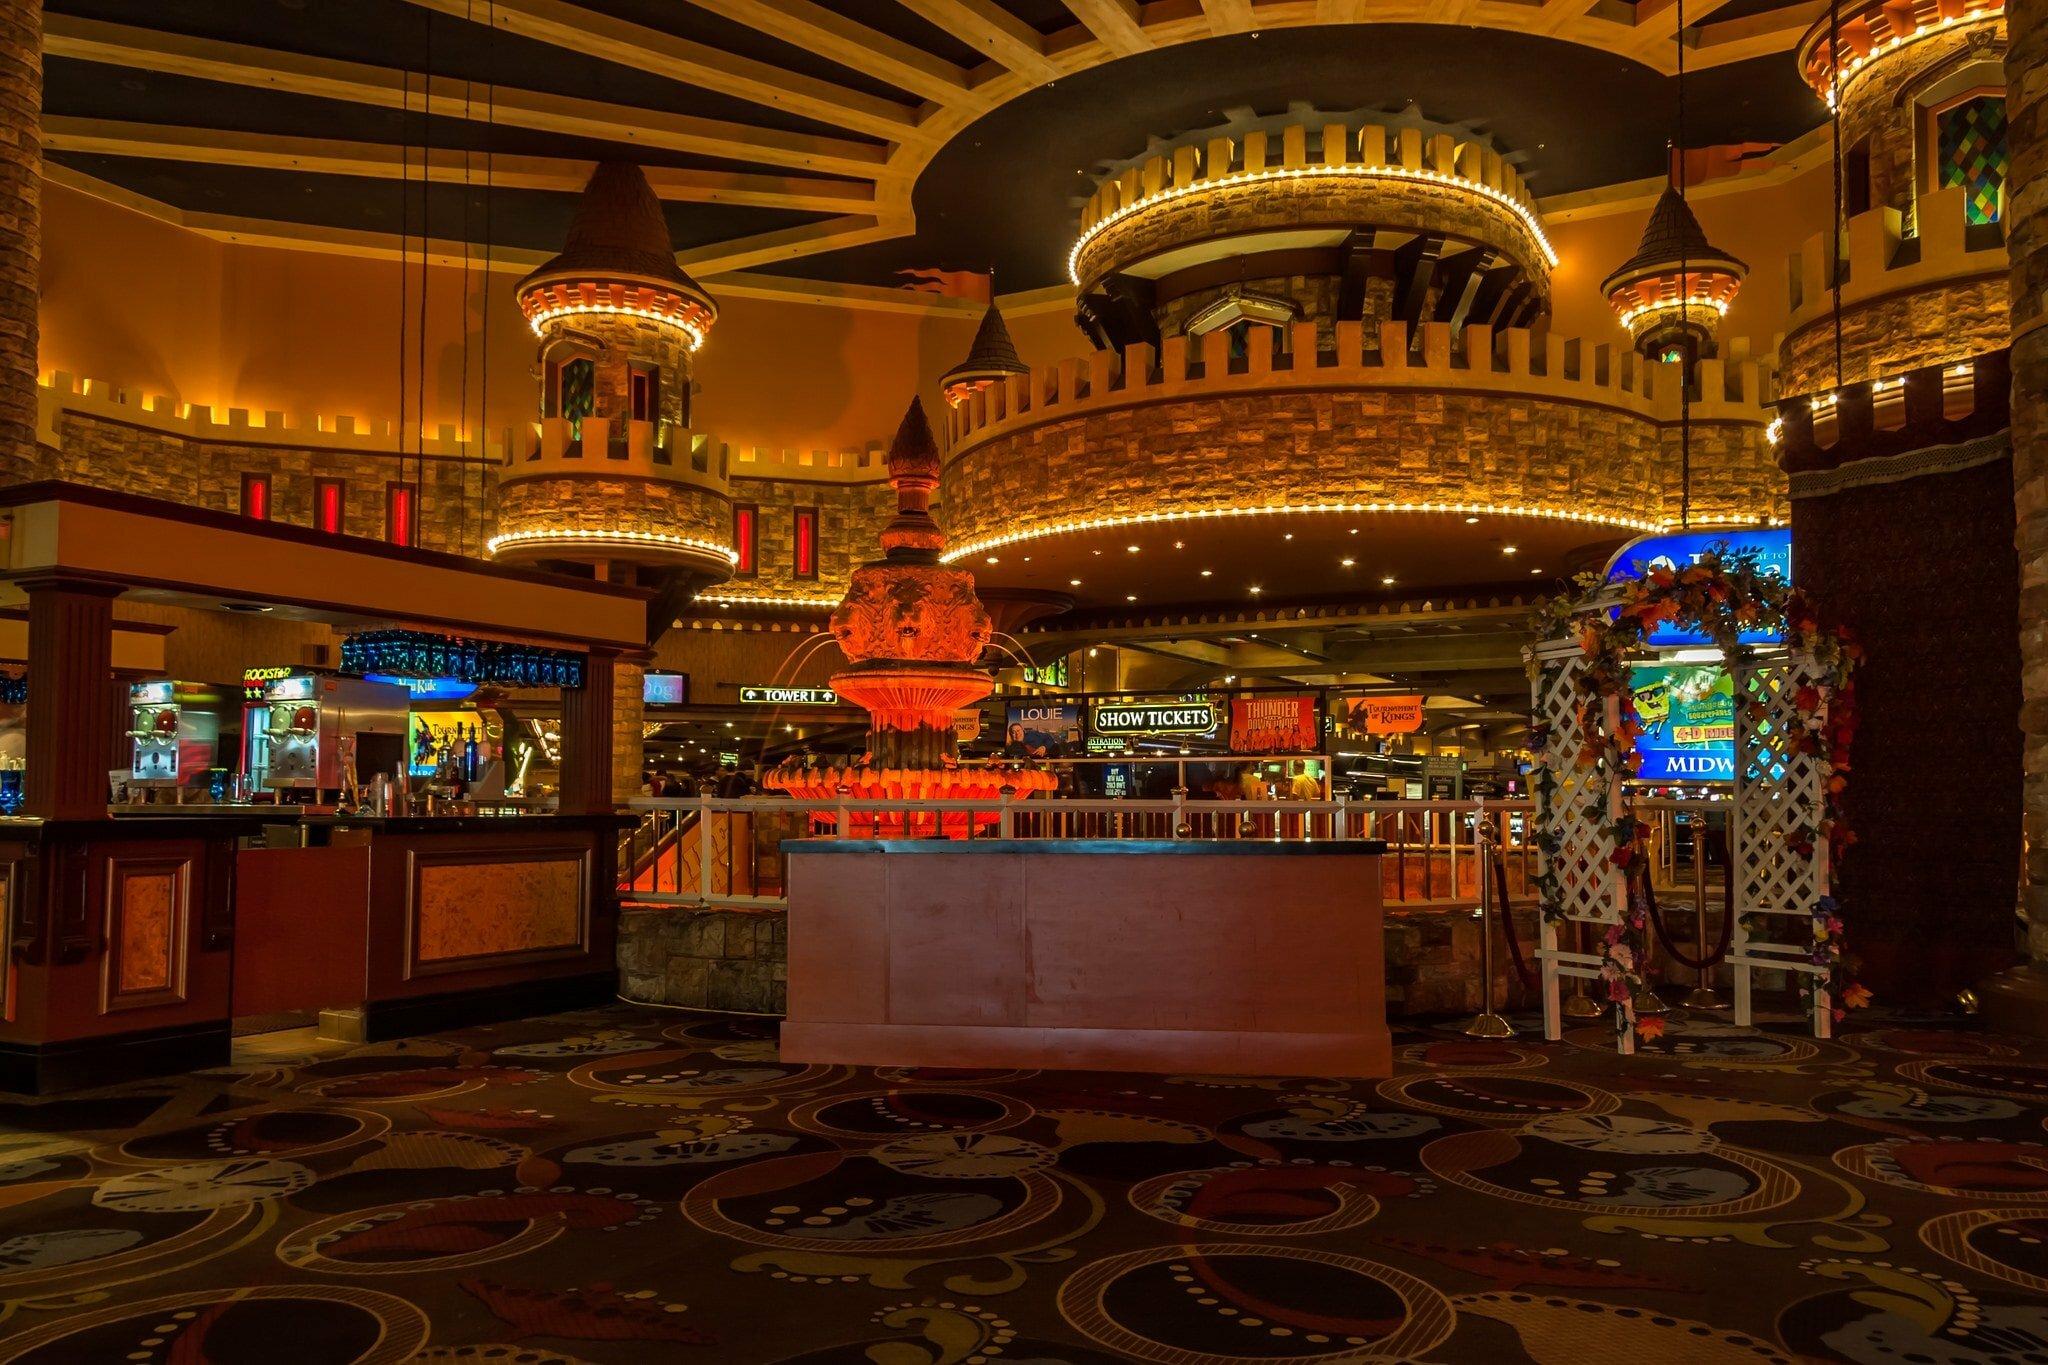 Buenos Aires' Casinos And Bingo Halls To Reopen December 14